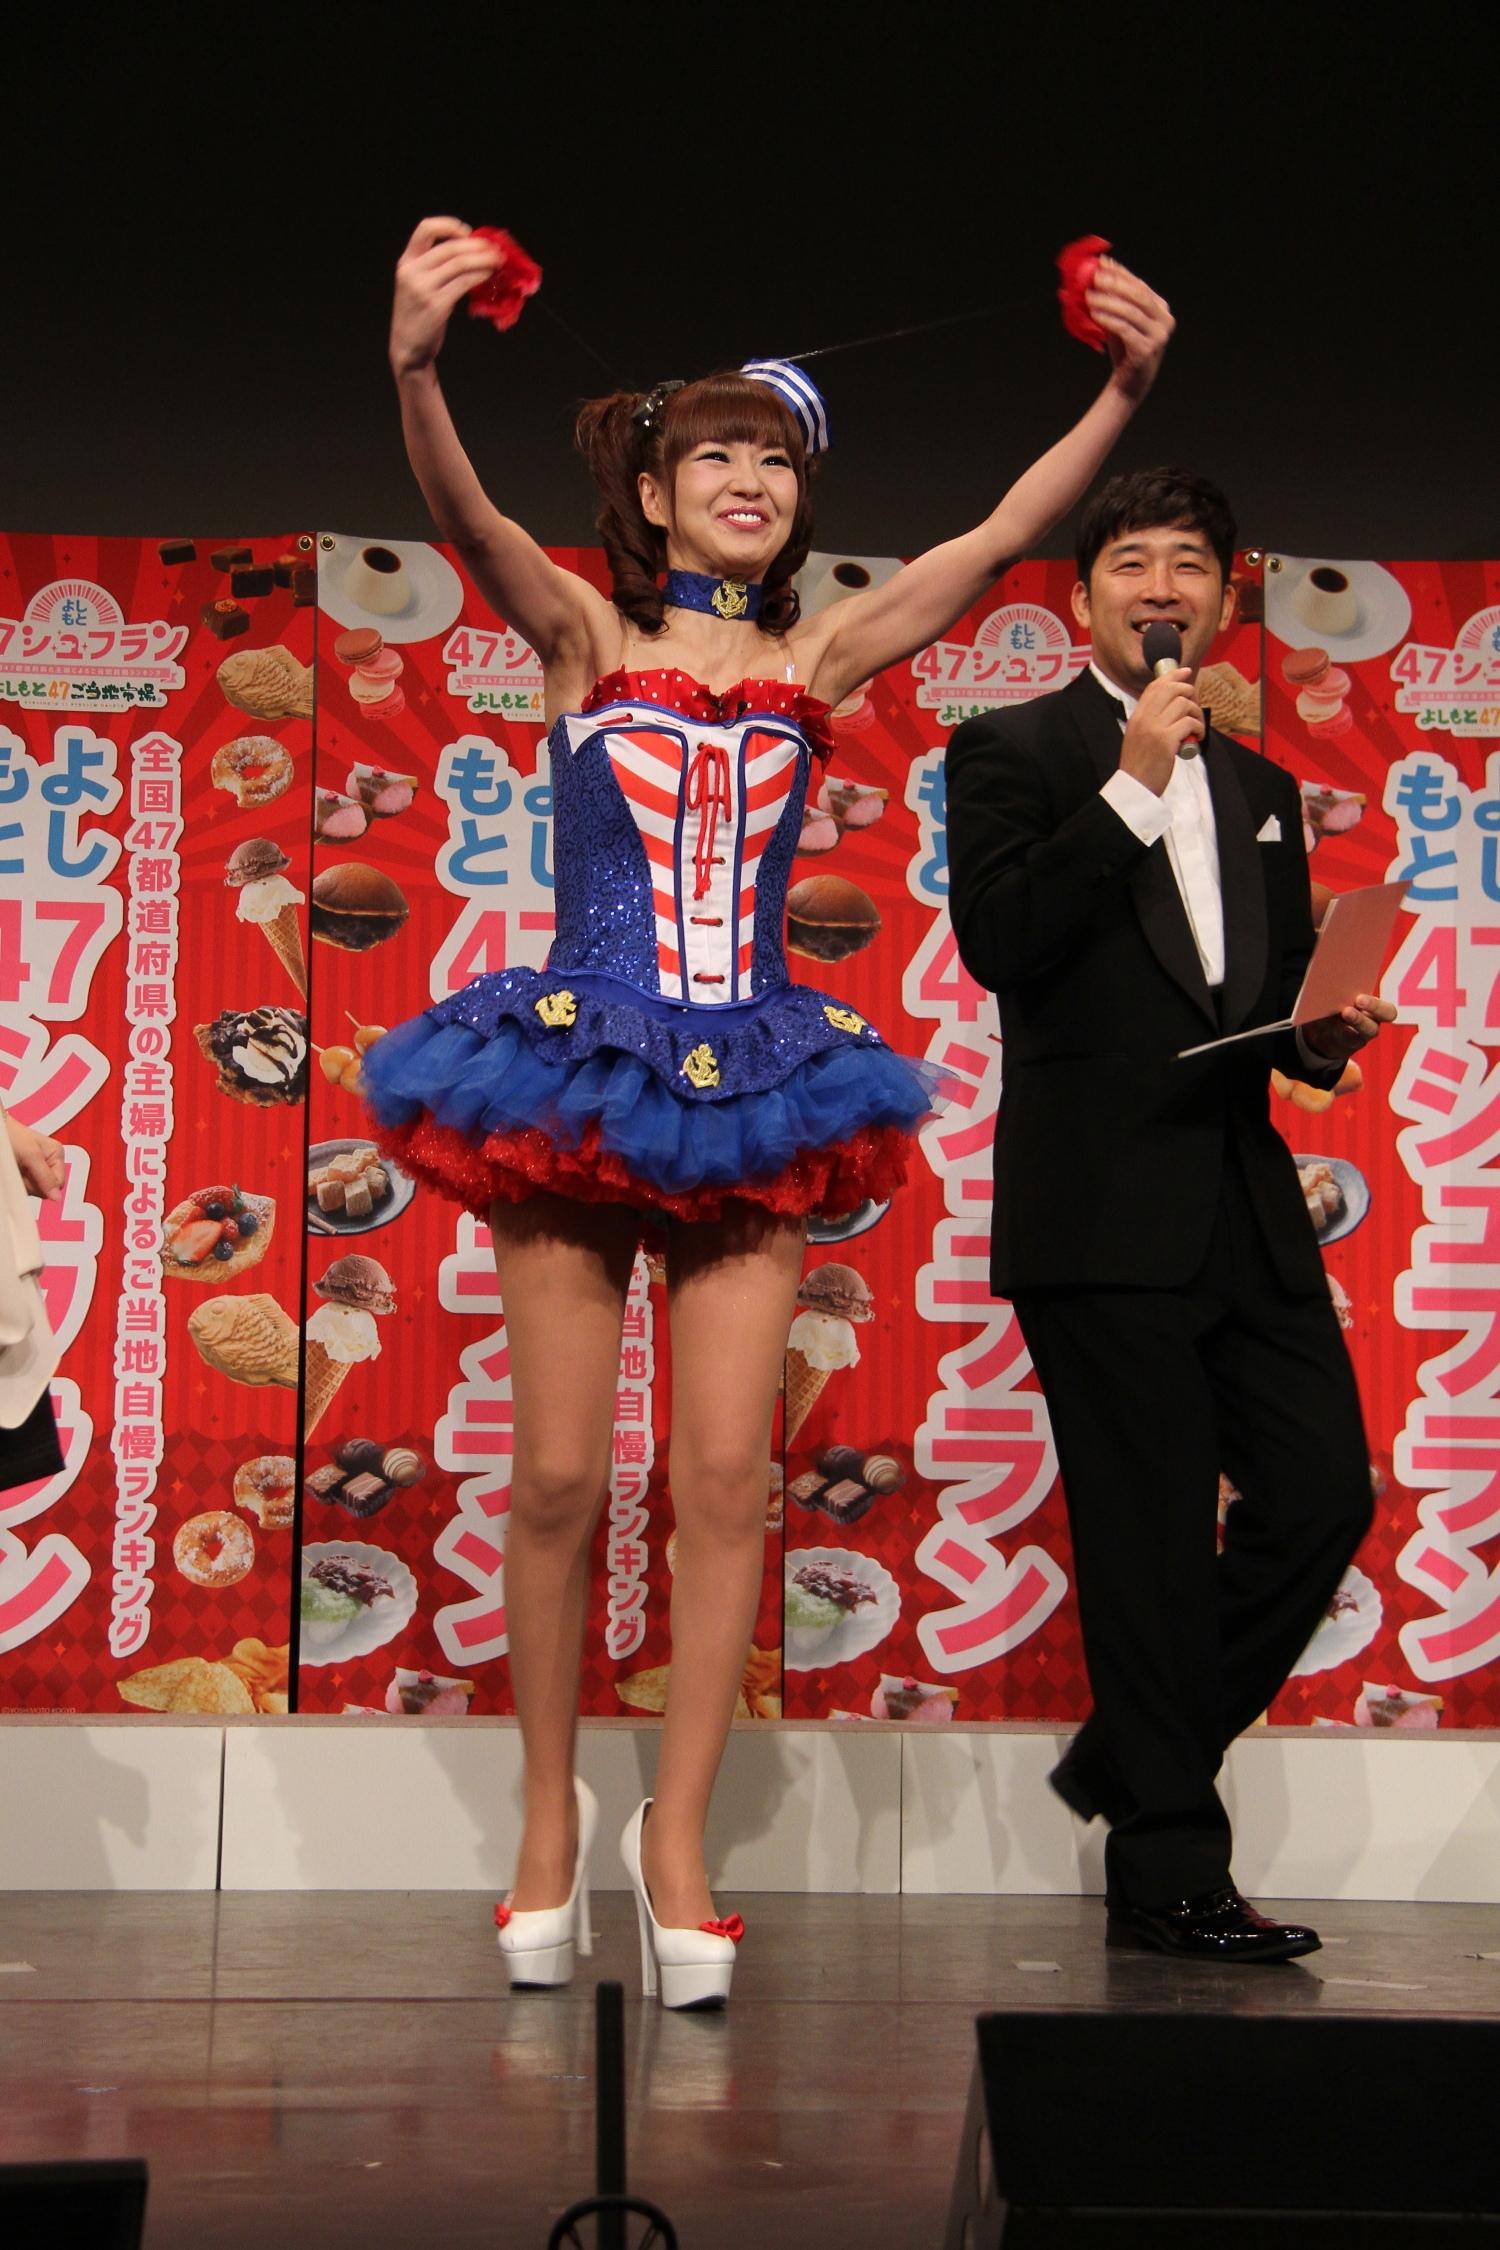 http://news.yoshimoto.co.jp/photos/uncategorized/2015/07/15/20150715234233-f2589c542bc82298bf129deeaf4a111f84faac56.jpg